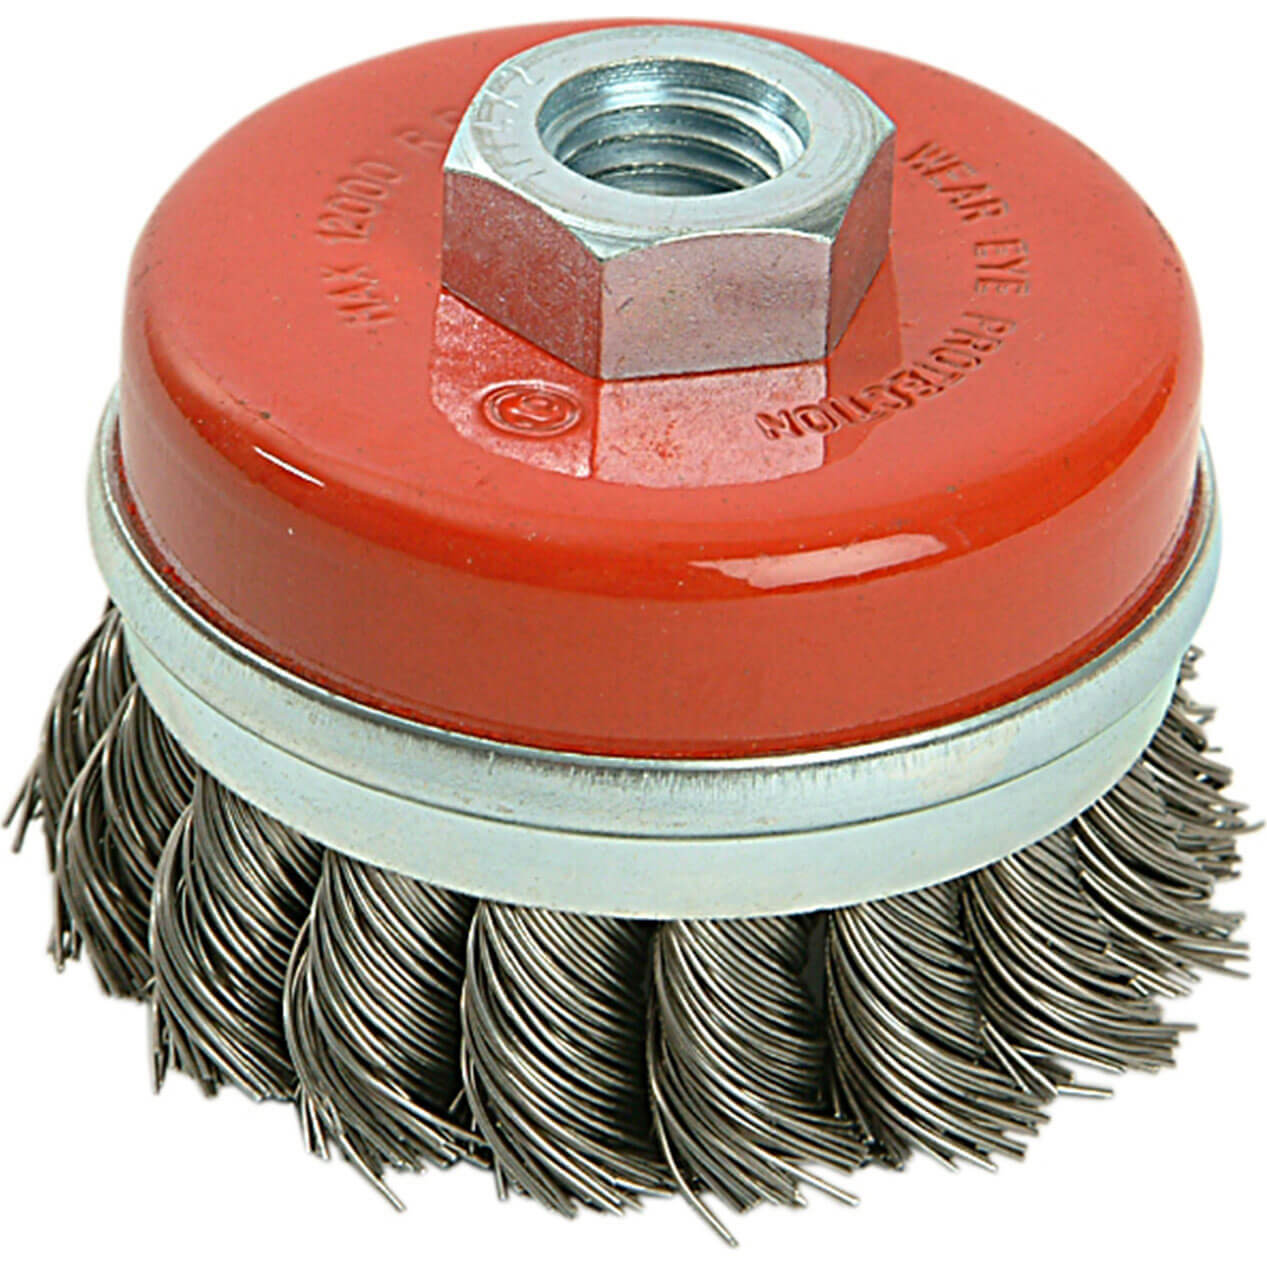 Image of Black & Decker X36080 Piranha Twist Knot Wire Cup Brush 65mm M14 Thread